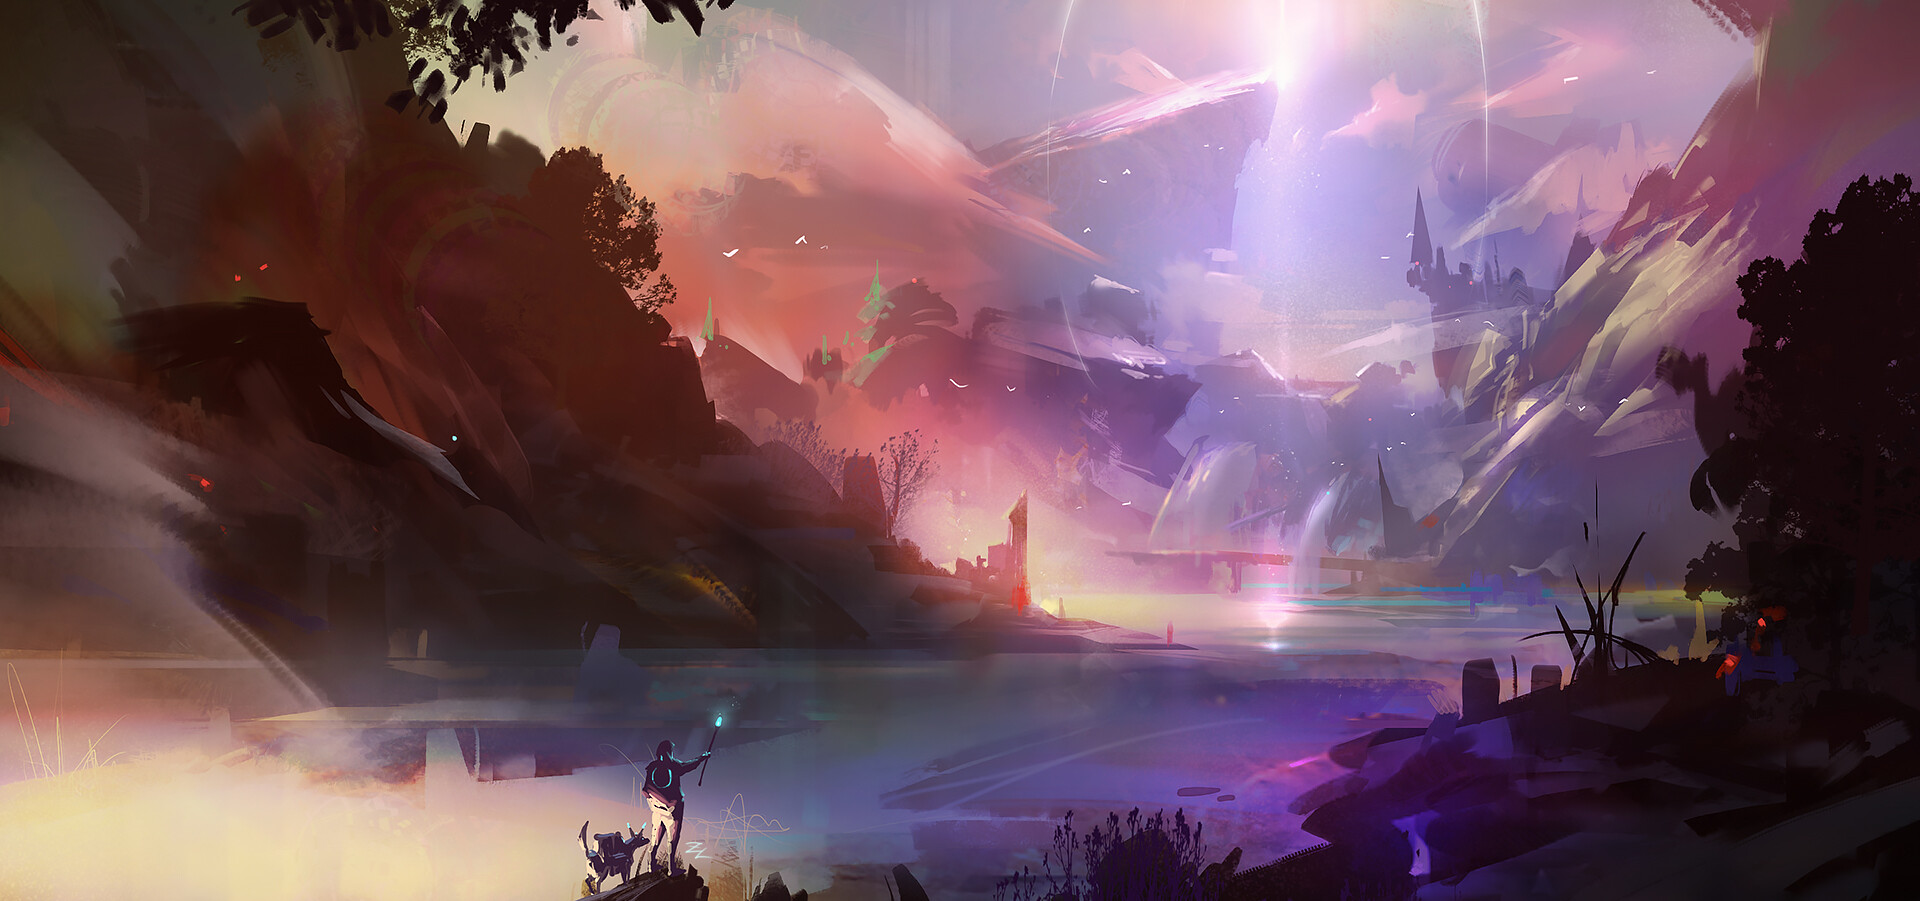 General 1920x901 artwork digital art river fantasy art rocks landscape